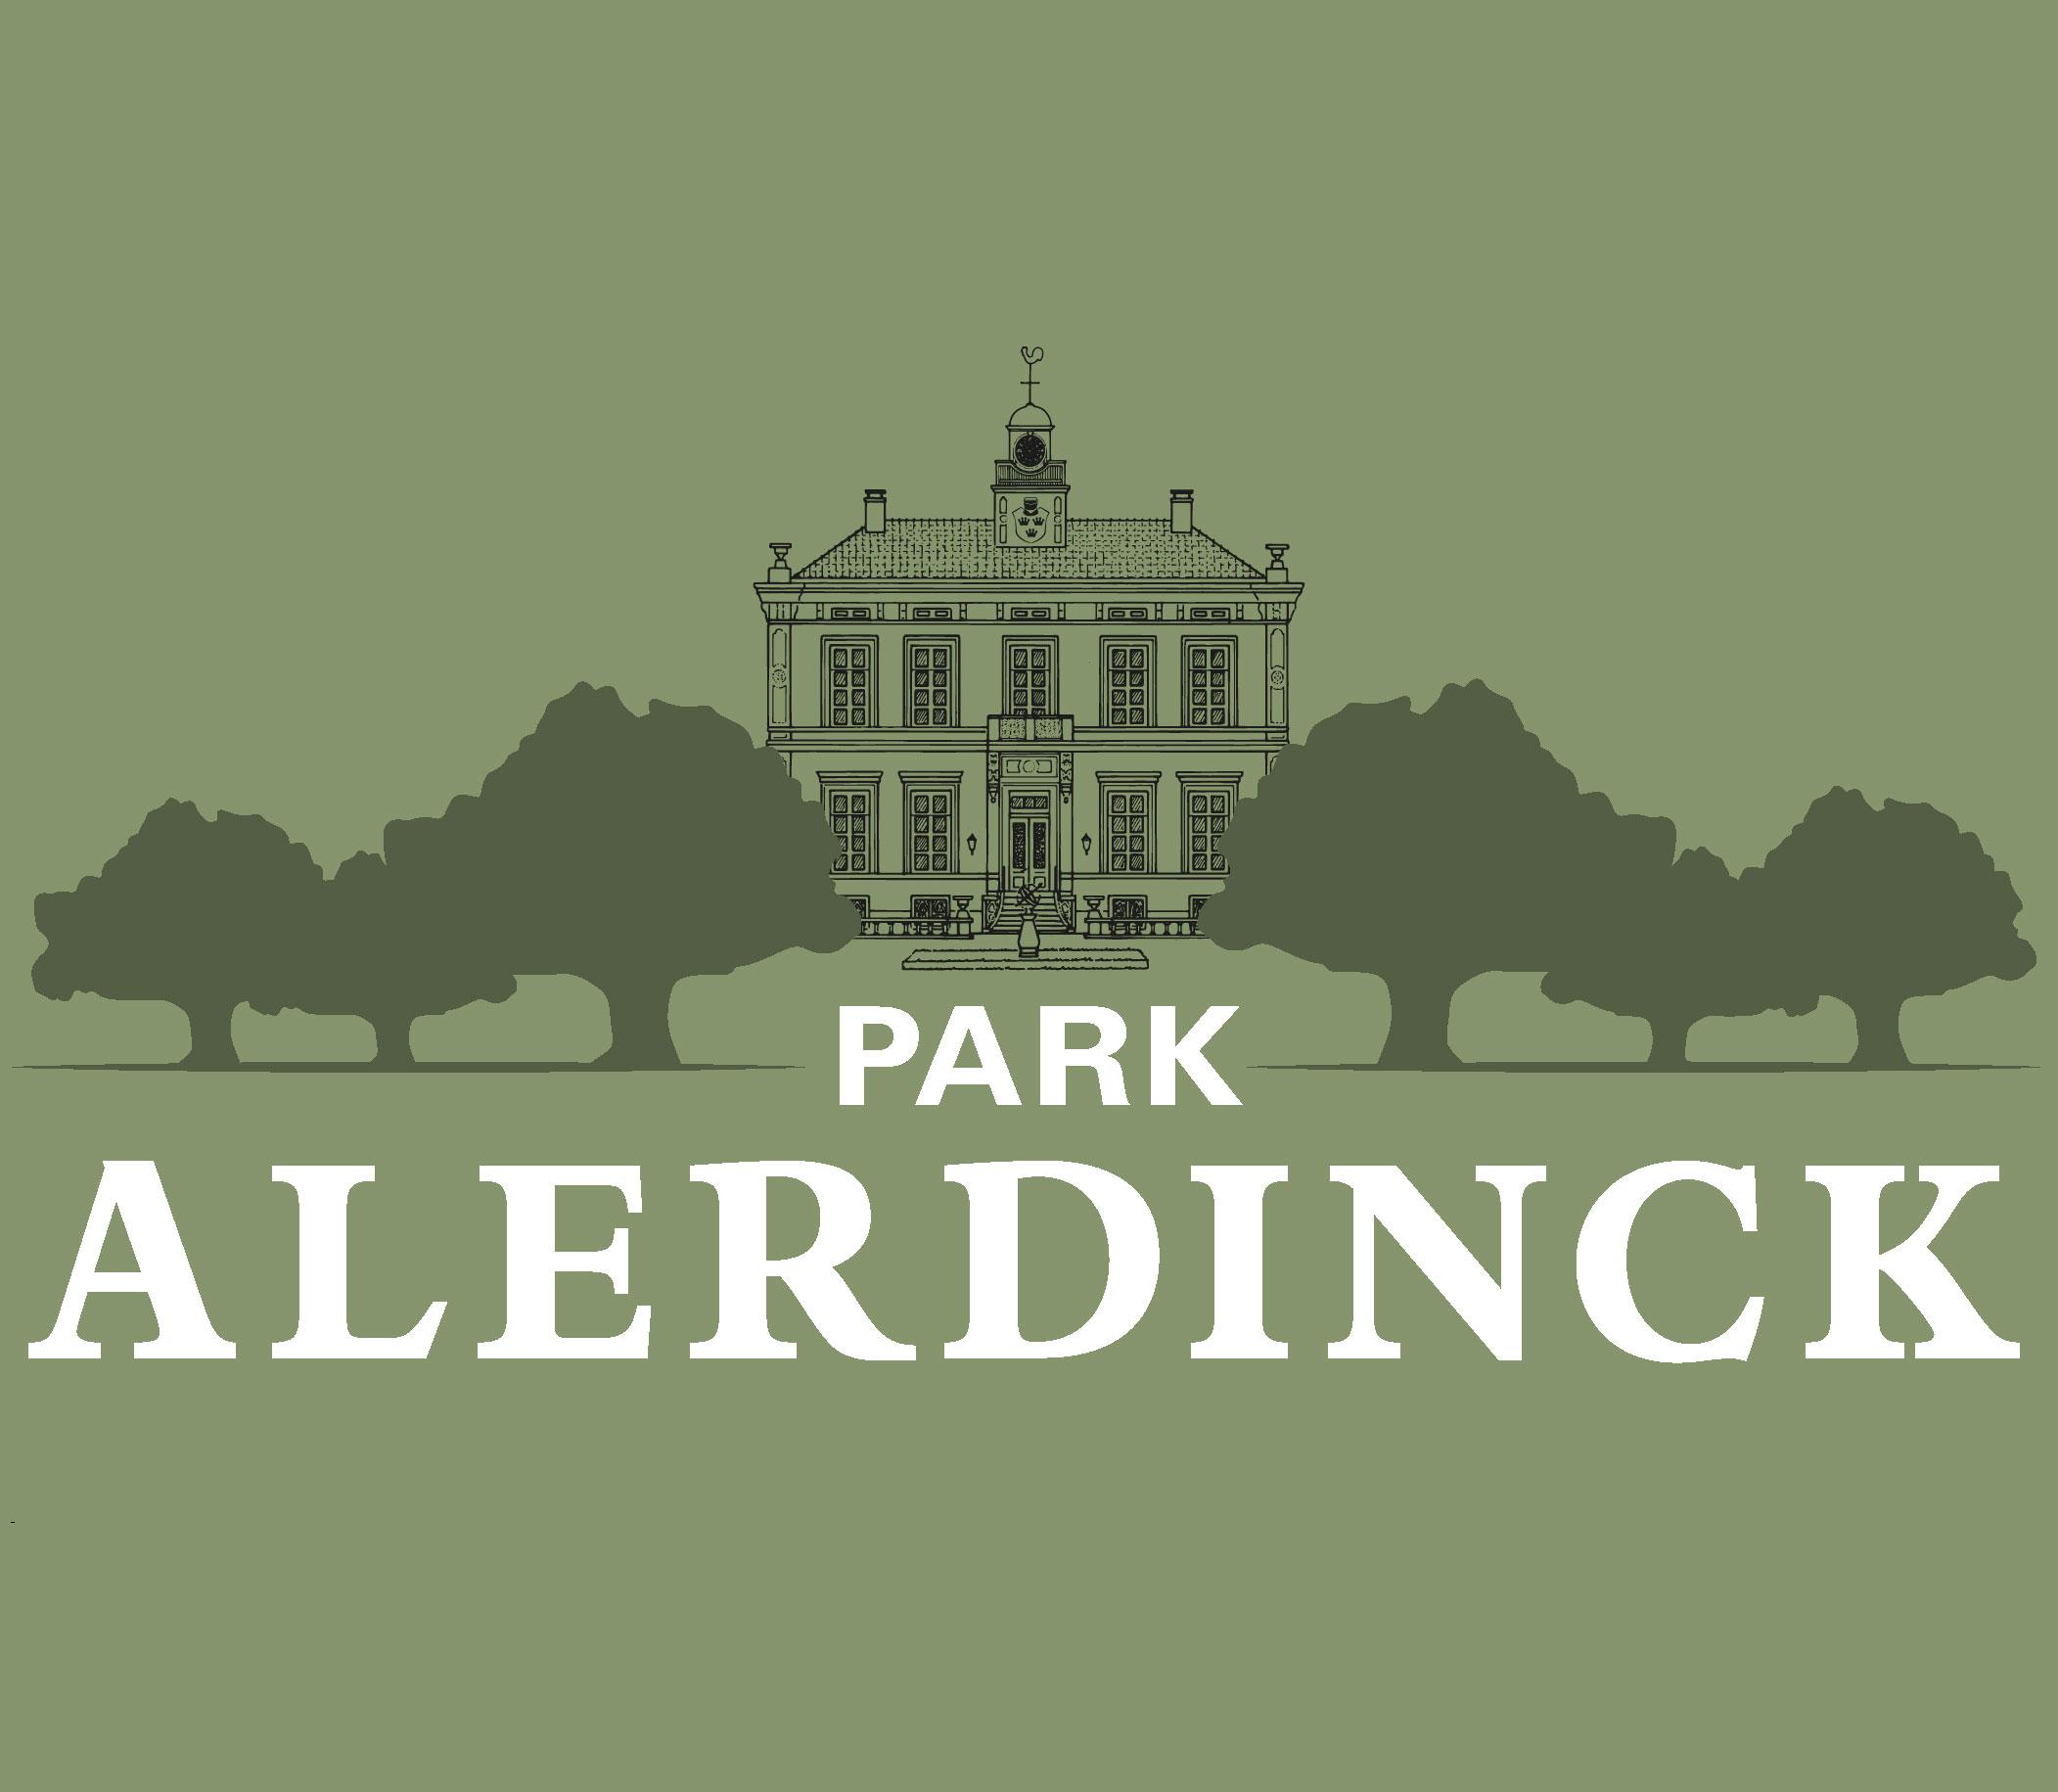 Park Alerdinck